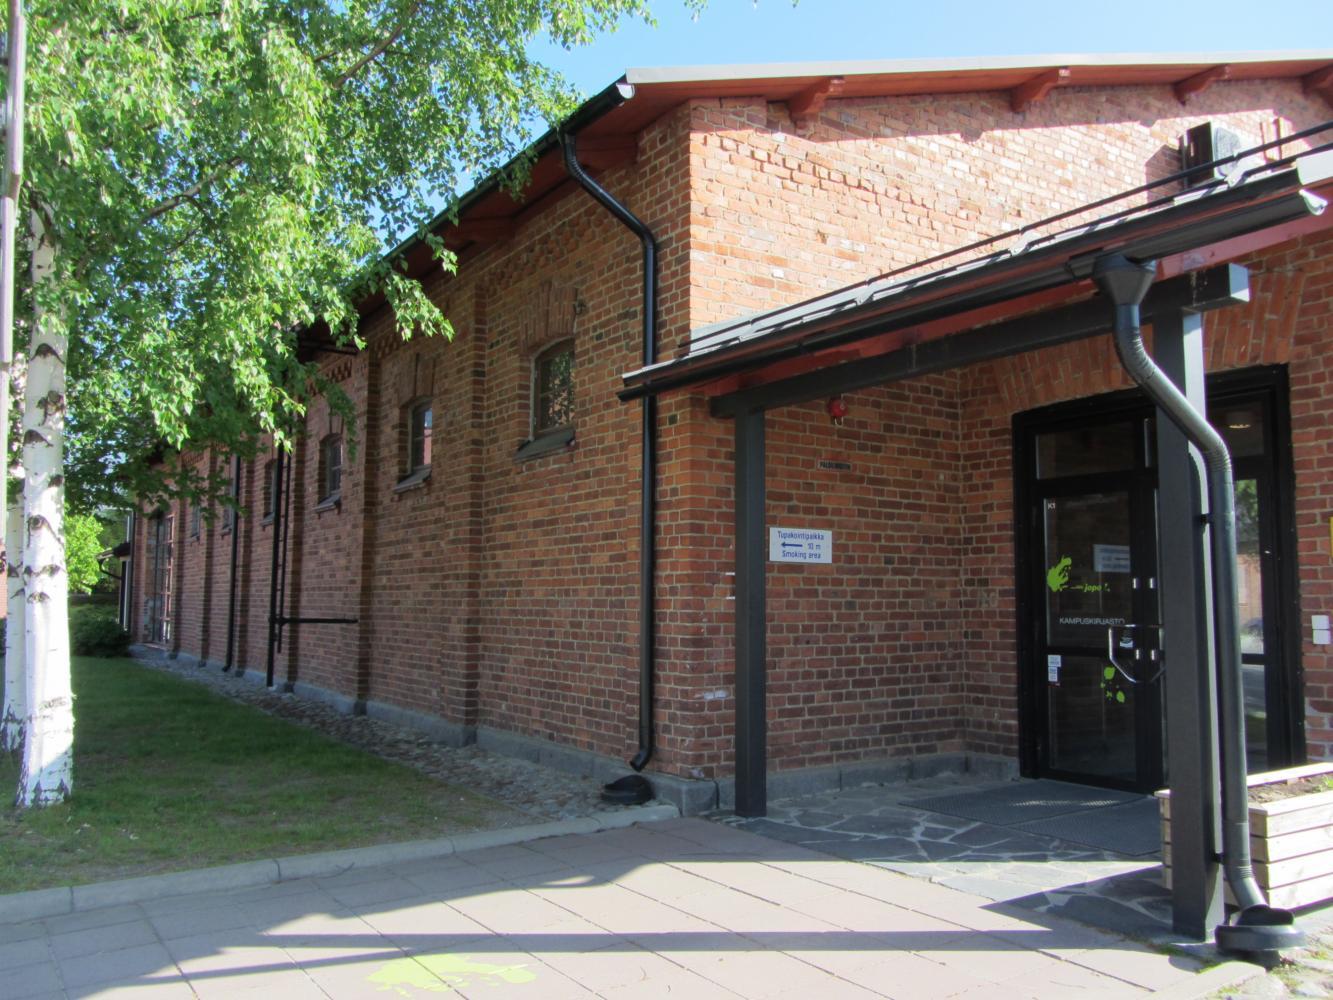 Mikkeli Campus library